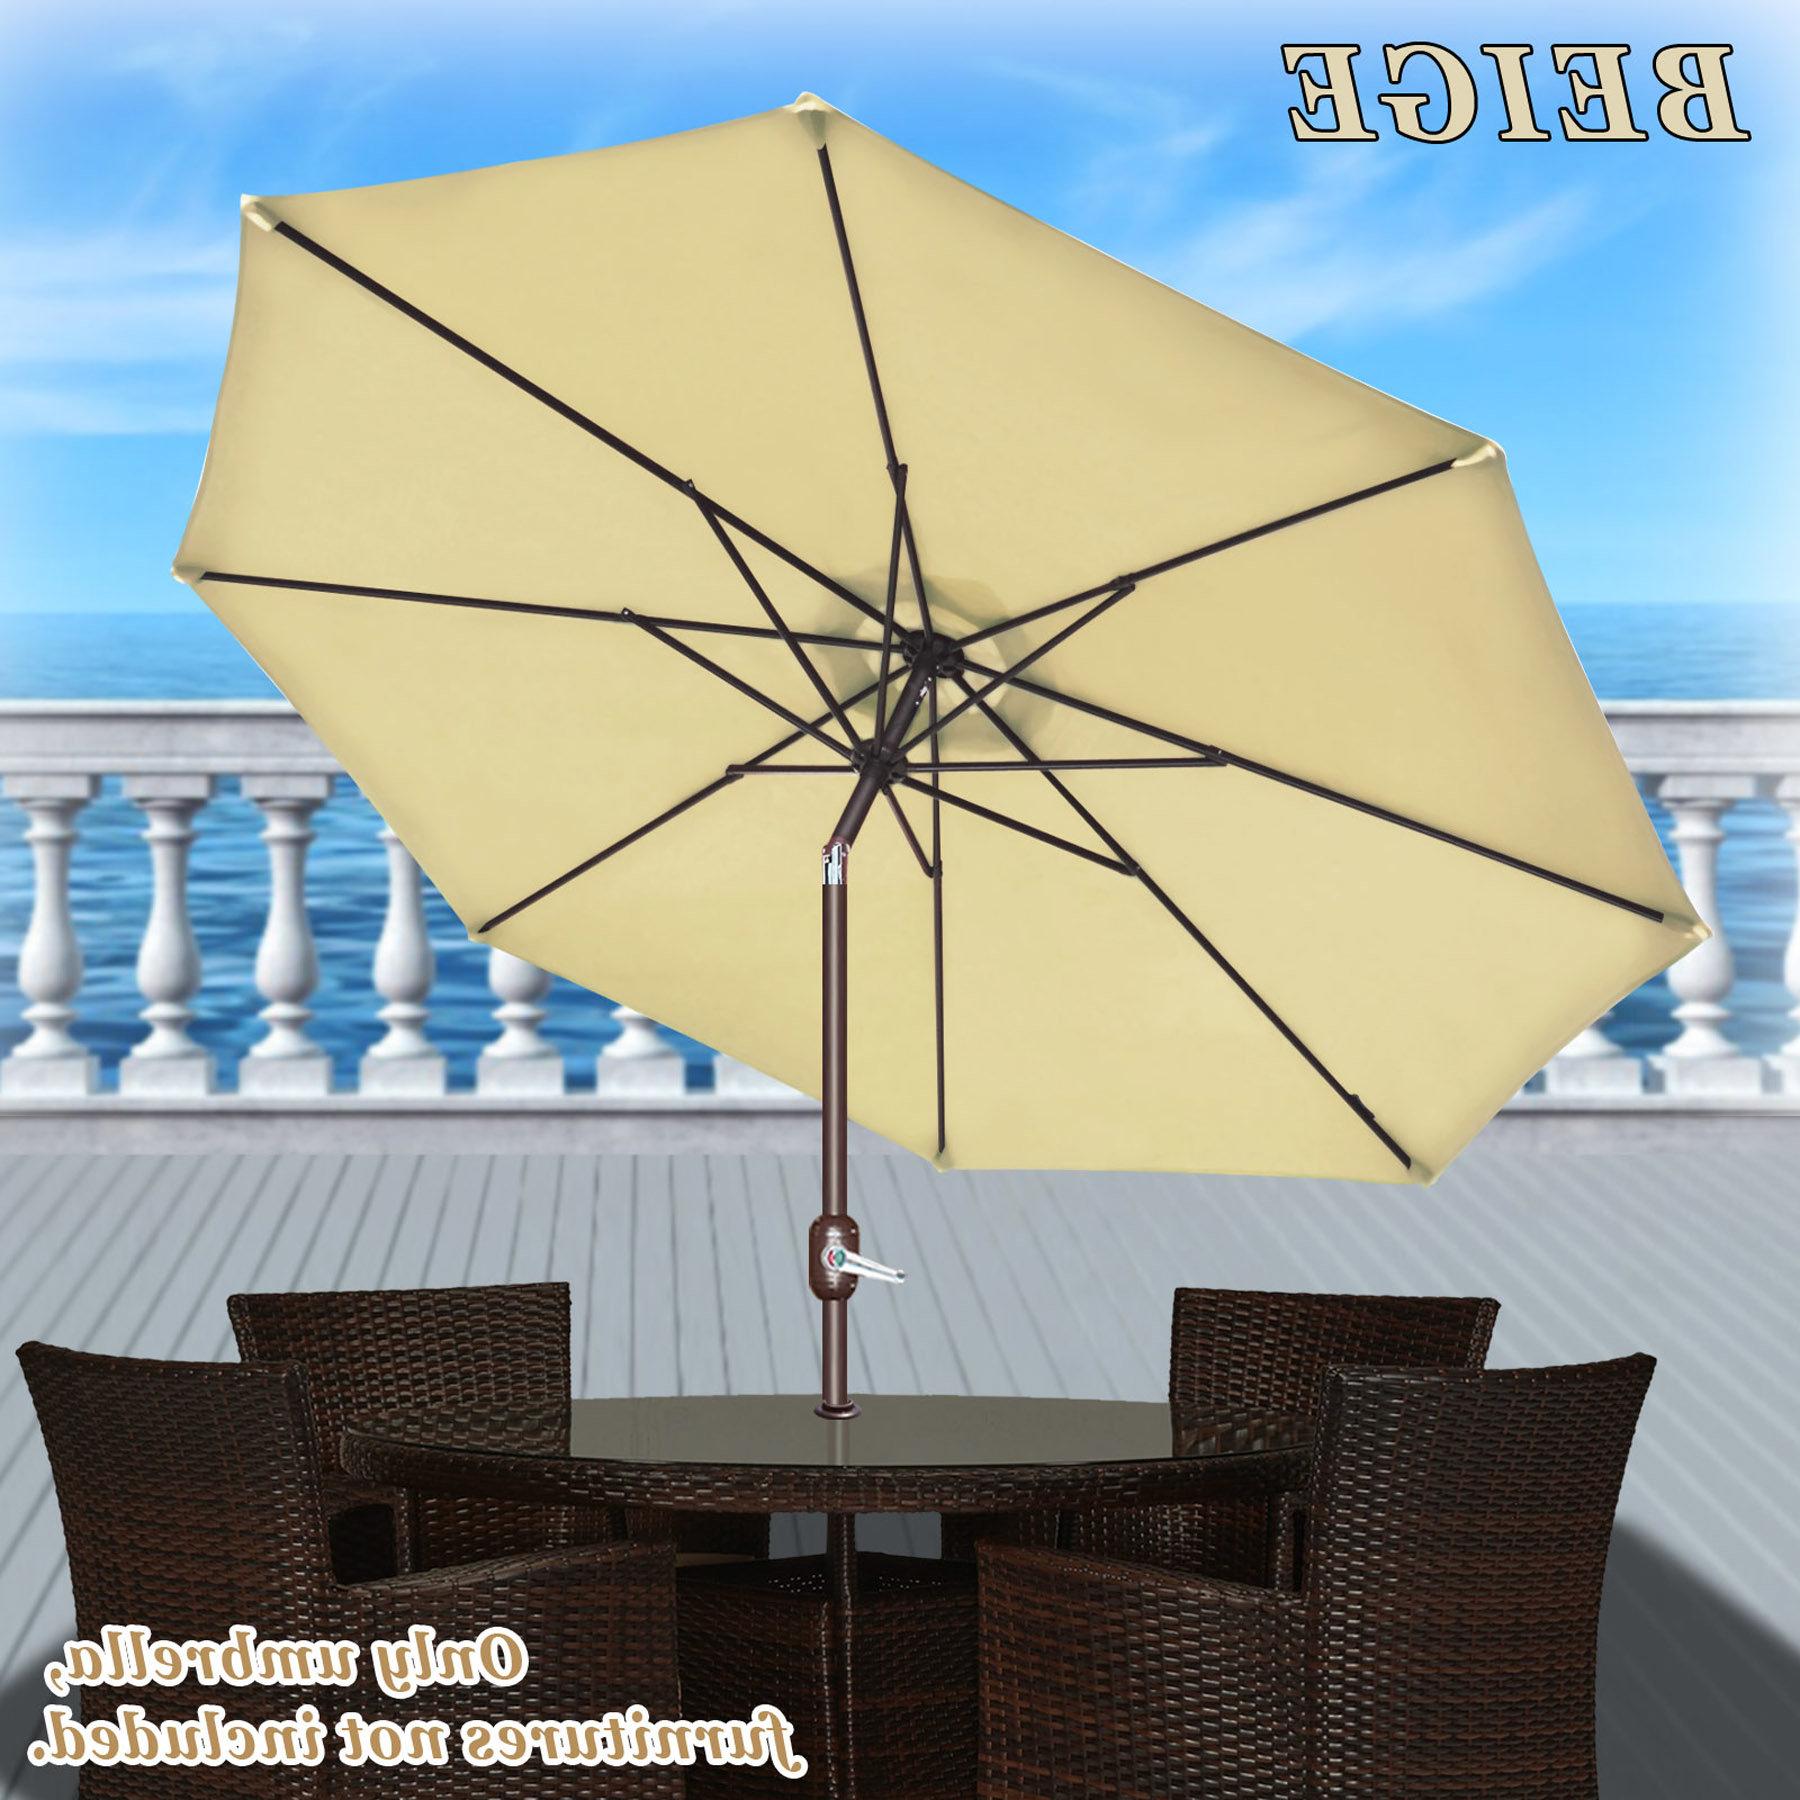 Wetherby Market Umbrellas Regarding Well Known Rosaura Traditional Octagonal Outdoor Garden Parasol Patio Market Umbrella (View 18 of 20)